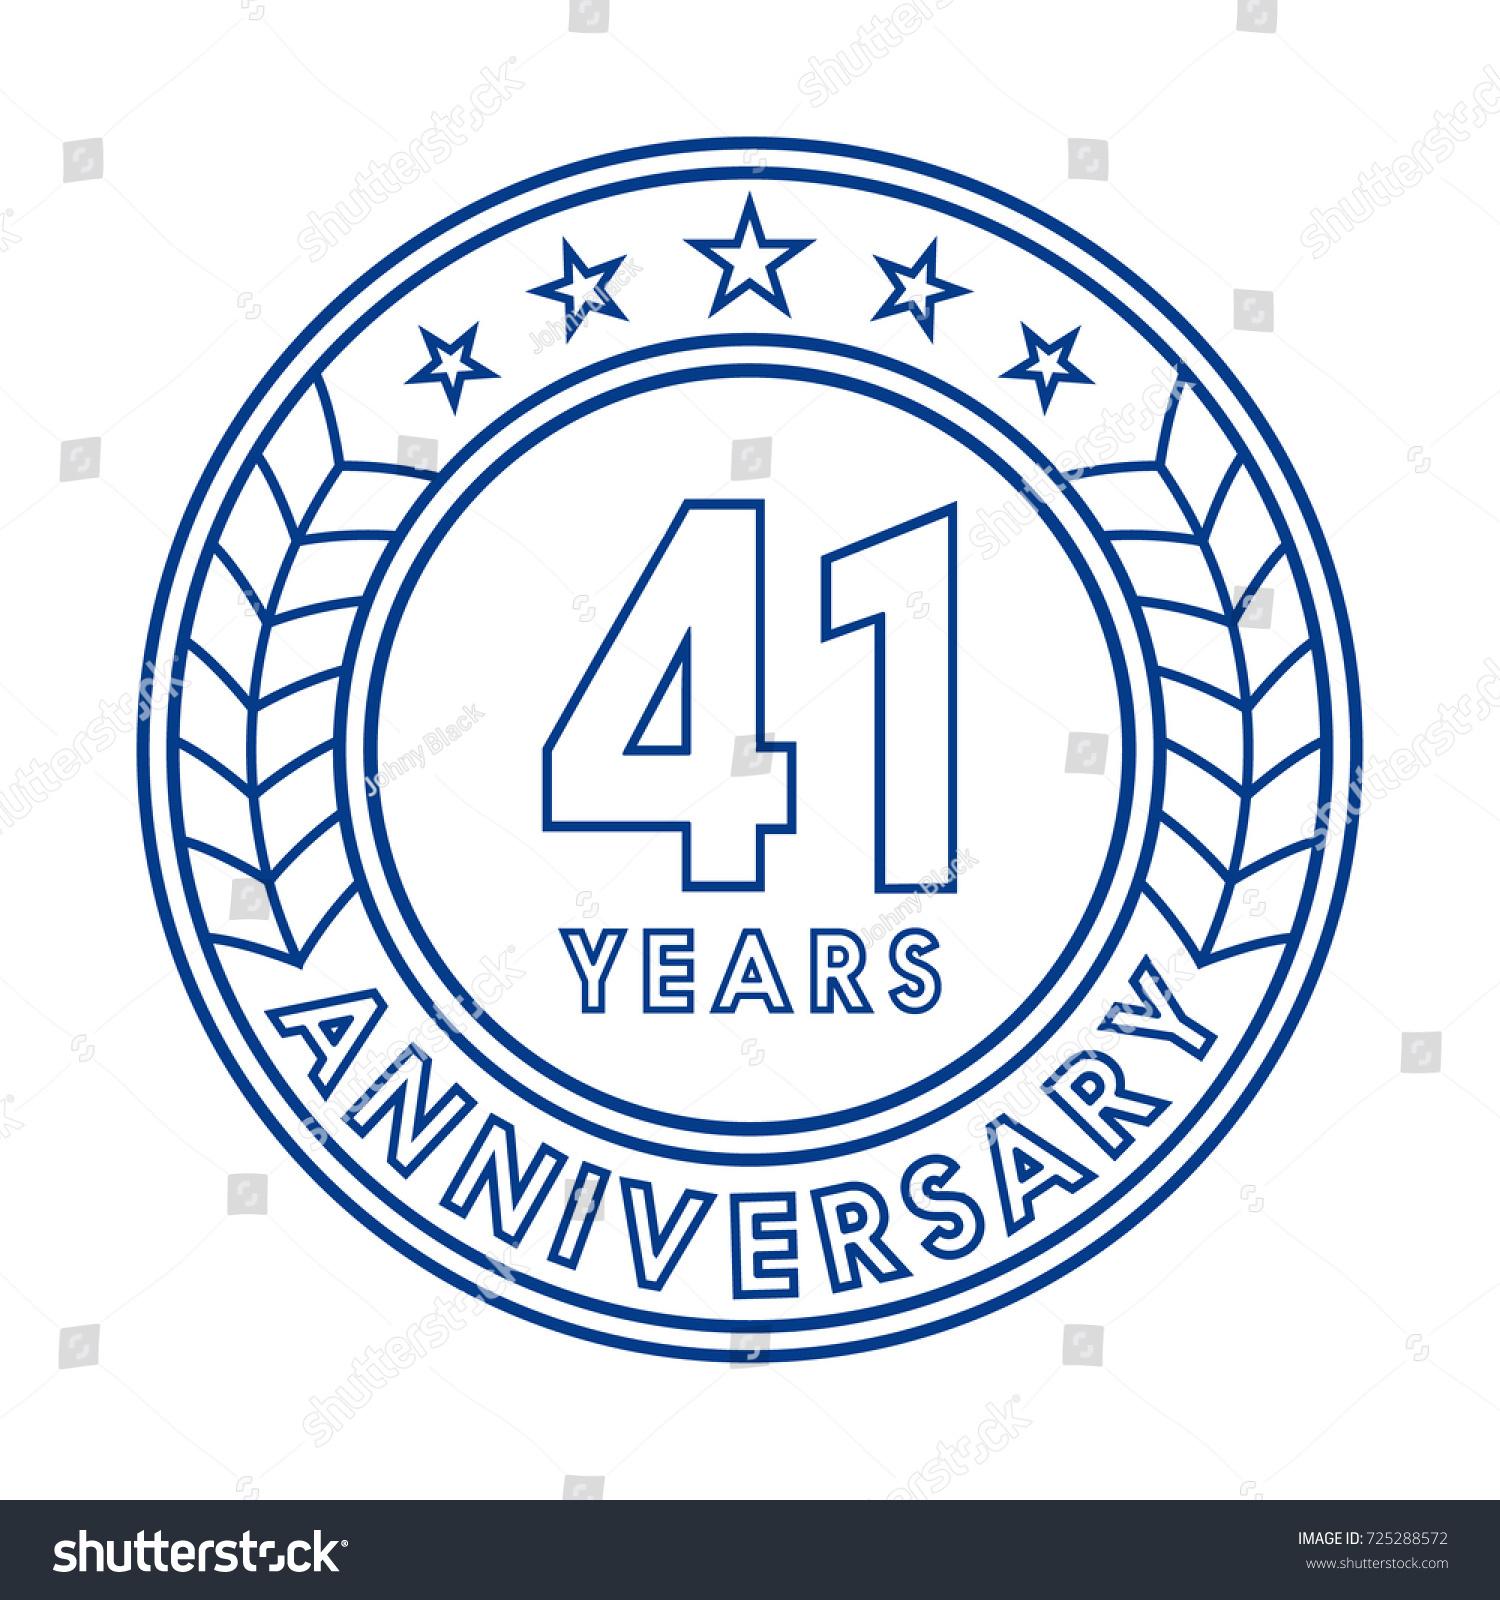 Years anniversary logo template stock vector